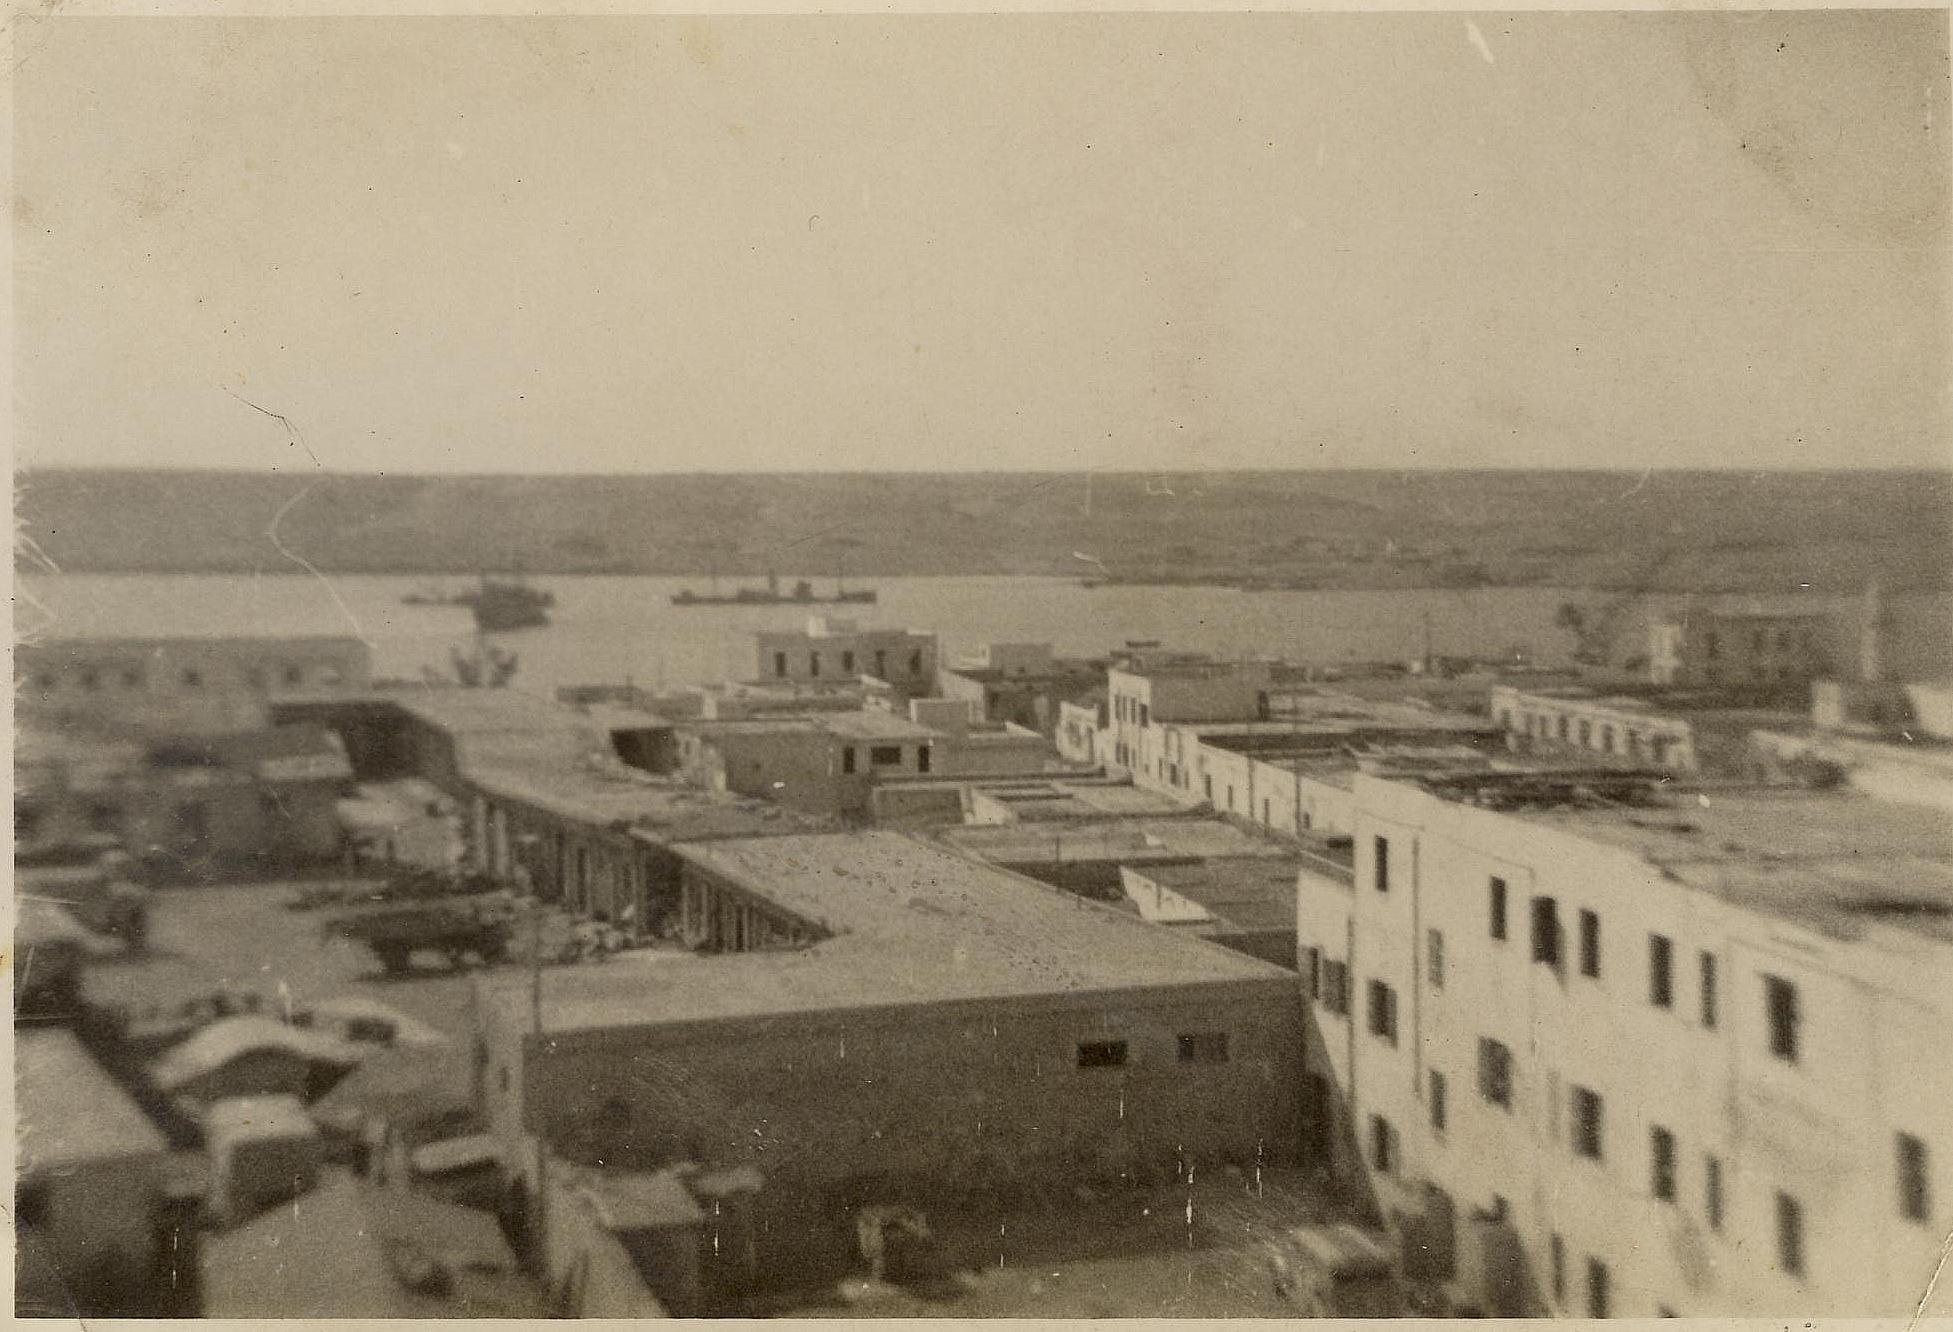 Tobruk, January 1942